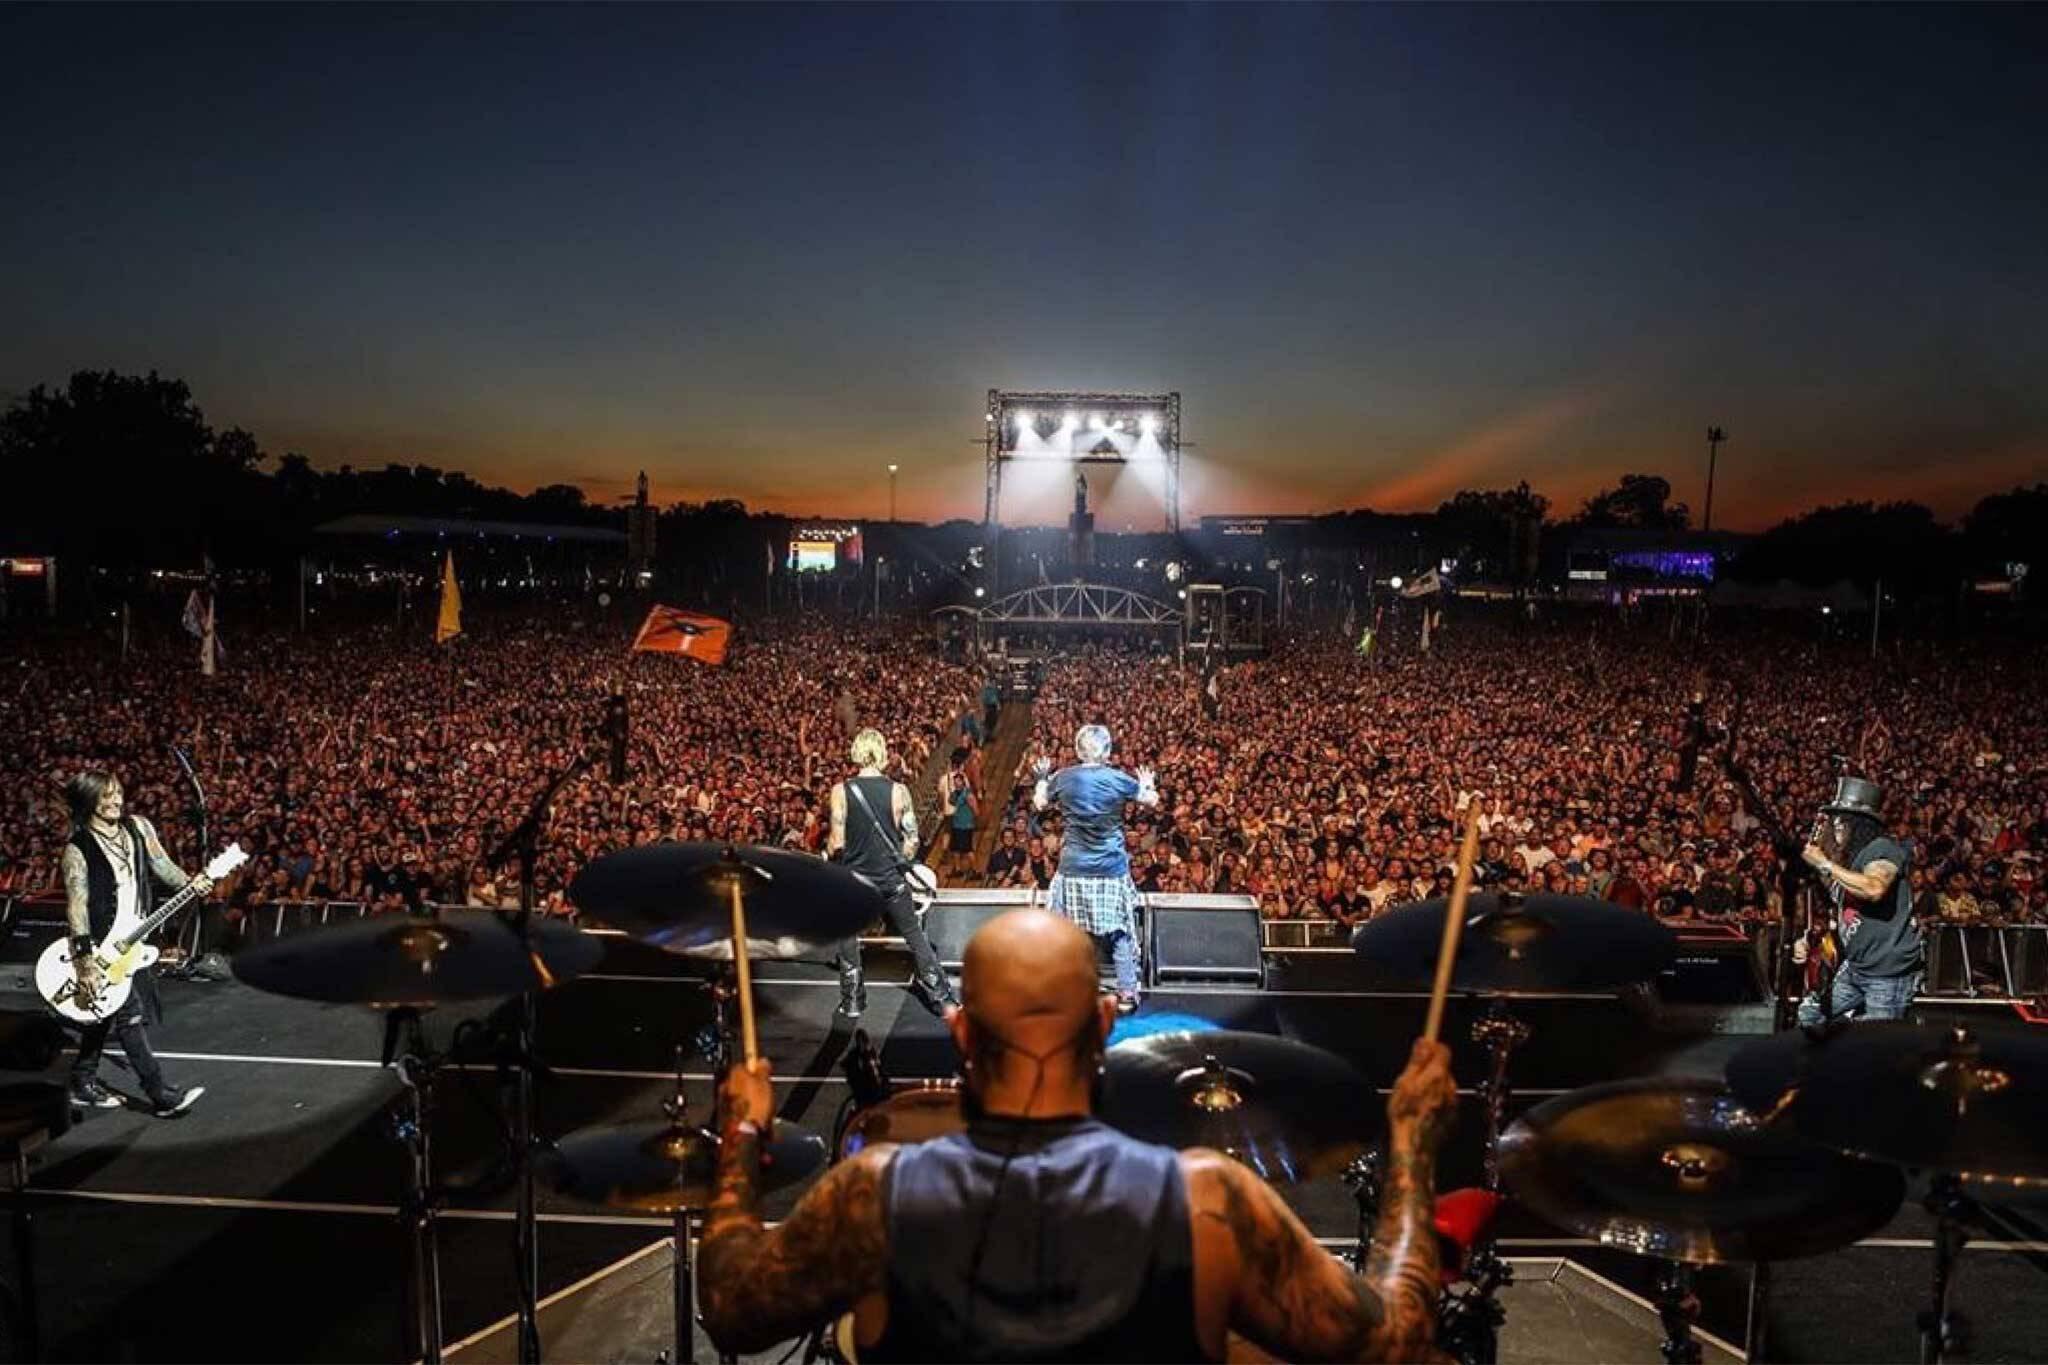 toronto concerts summer 2020